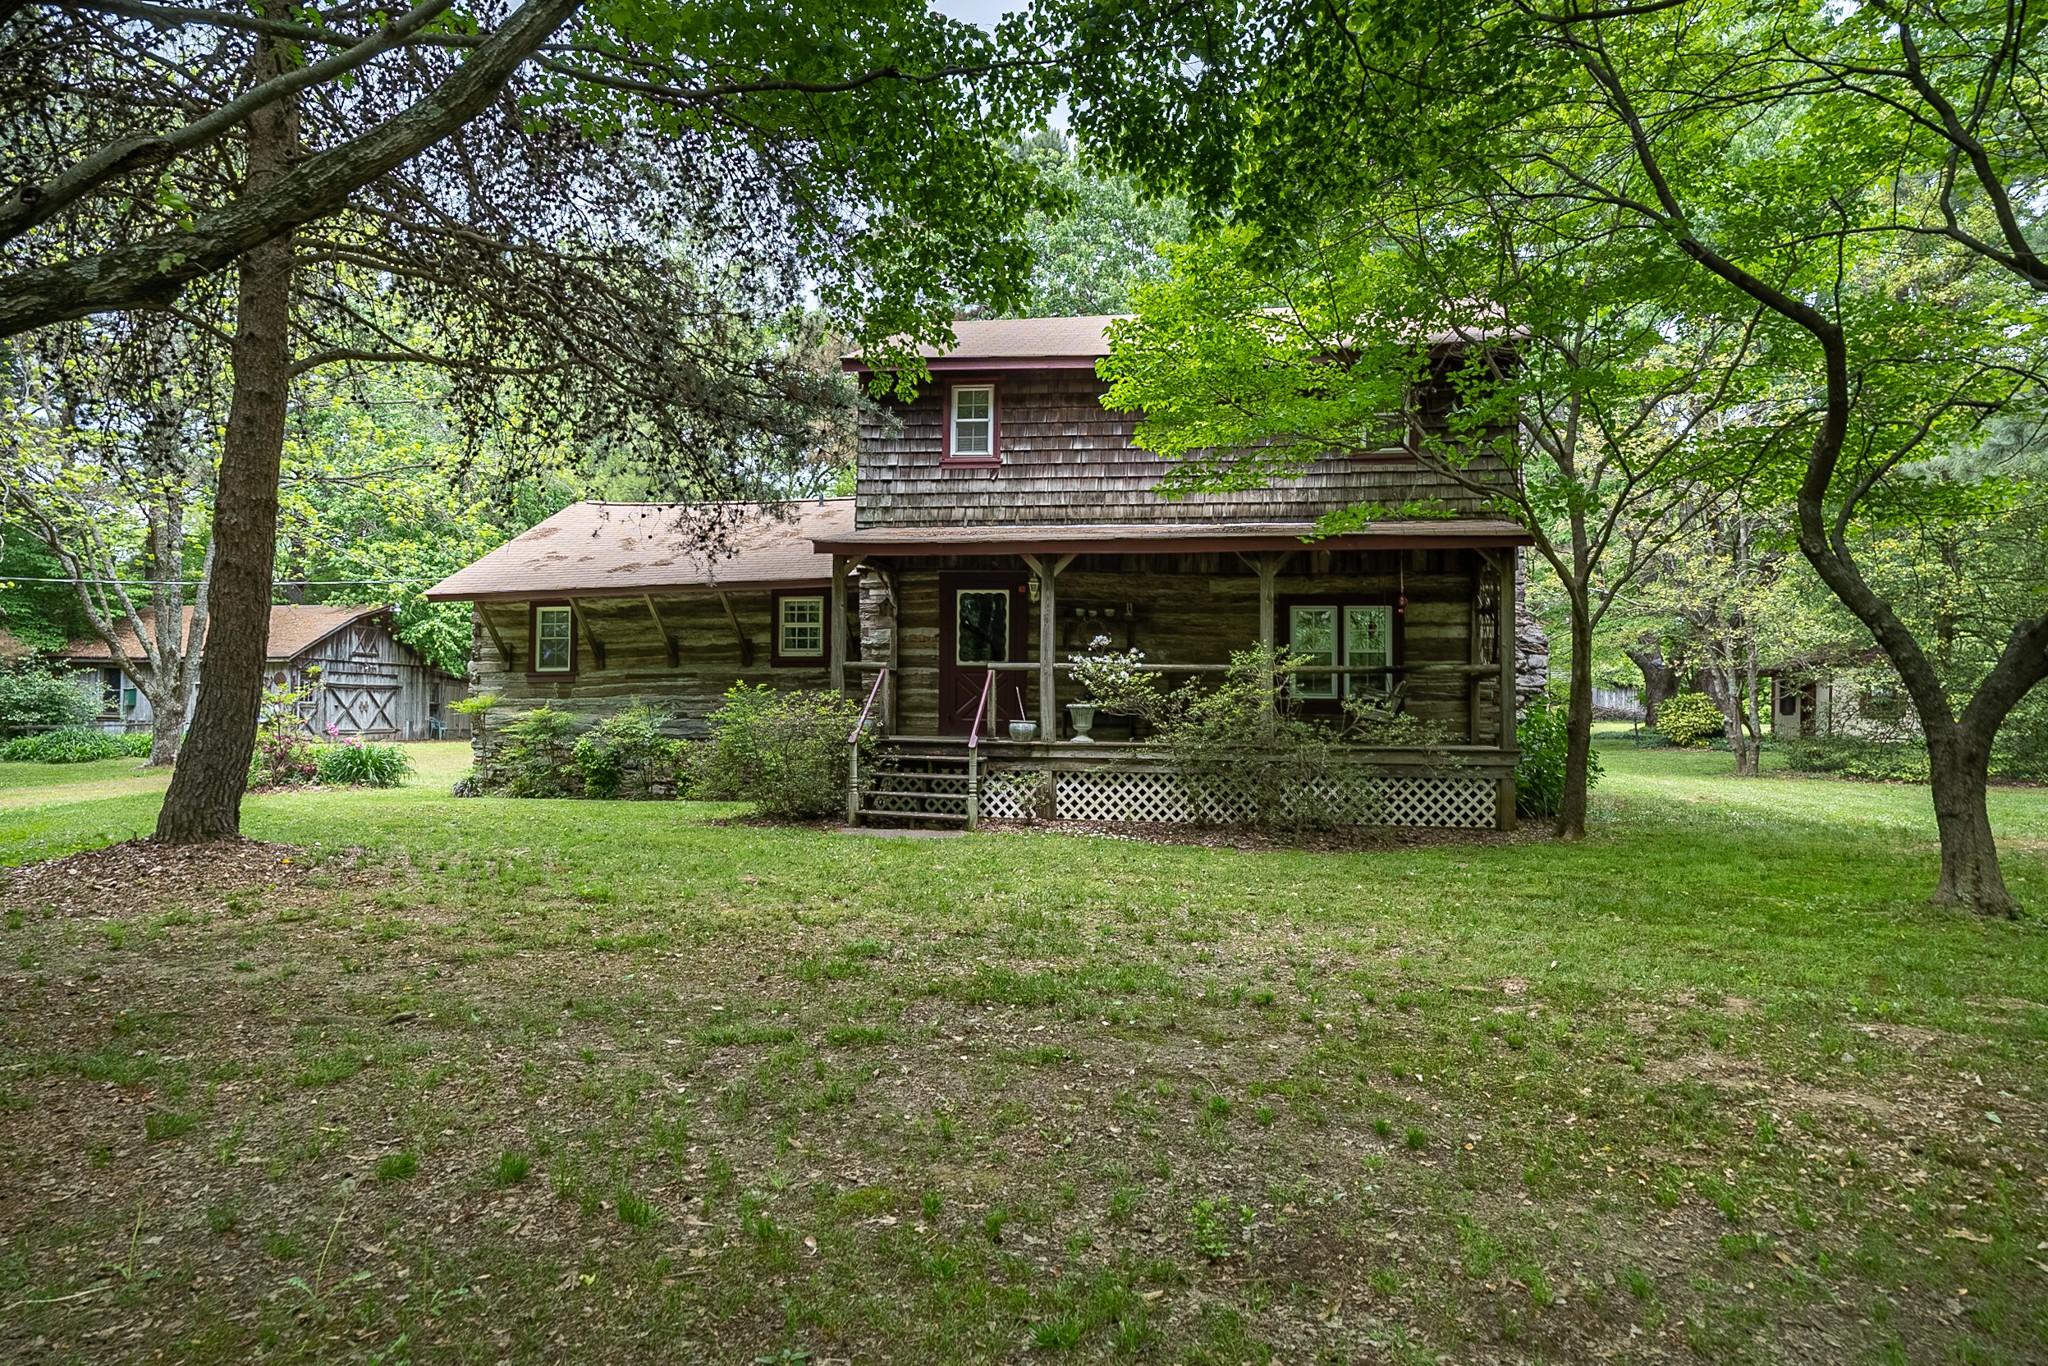 48 E Edan Rd Property Photo - Ethridge, TN real estate listing